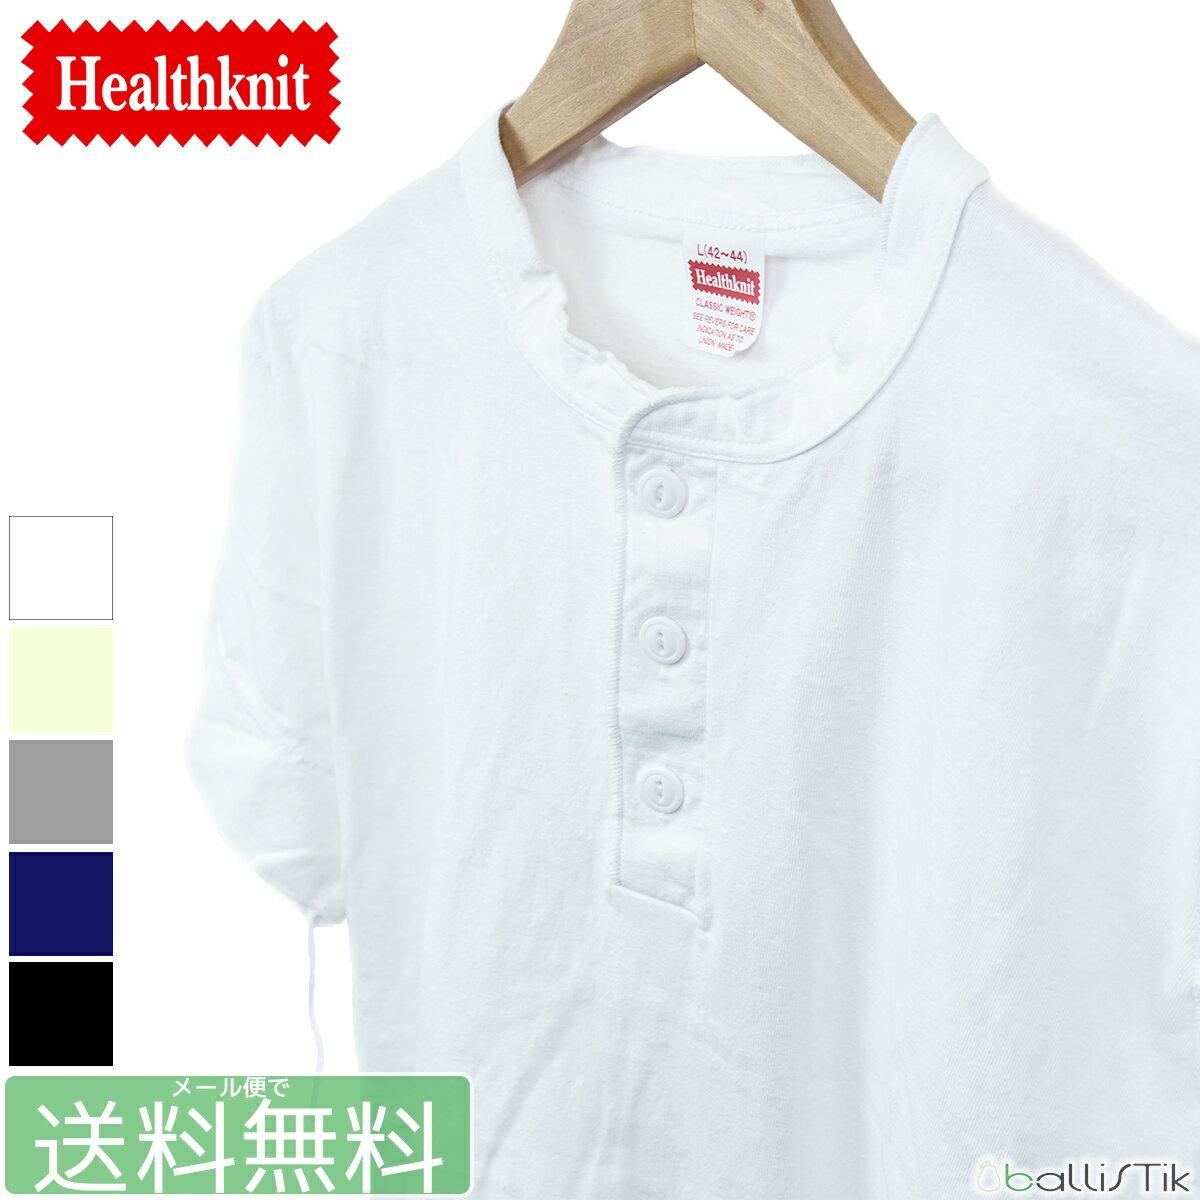 Healthknit ヘルスニット ヘンリーネック Tシャツ ティーシャツ 半袖 無地 906s メンズ レディース ストリート メール便対応 【某タレント着用で話題沸騰】【 メール便で 送料無料 】